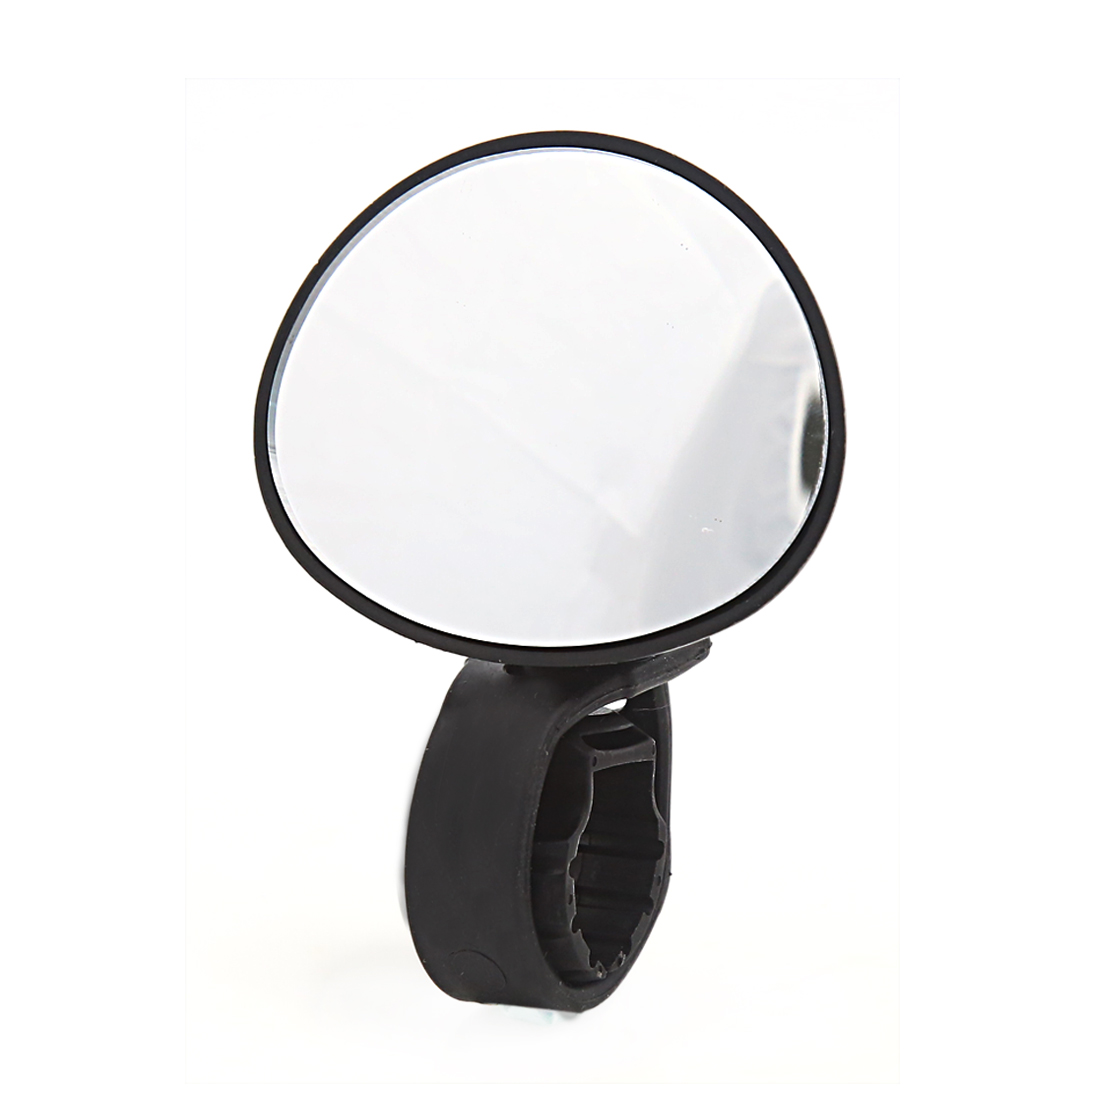 Cycling Bike Plastic Shell Rotating Handlebar Safety Rearview Mirror Black